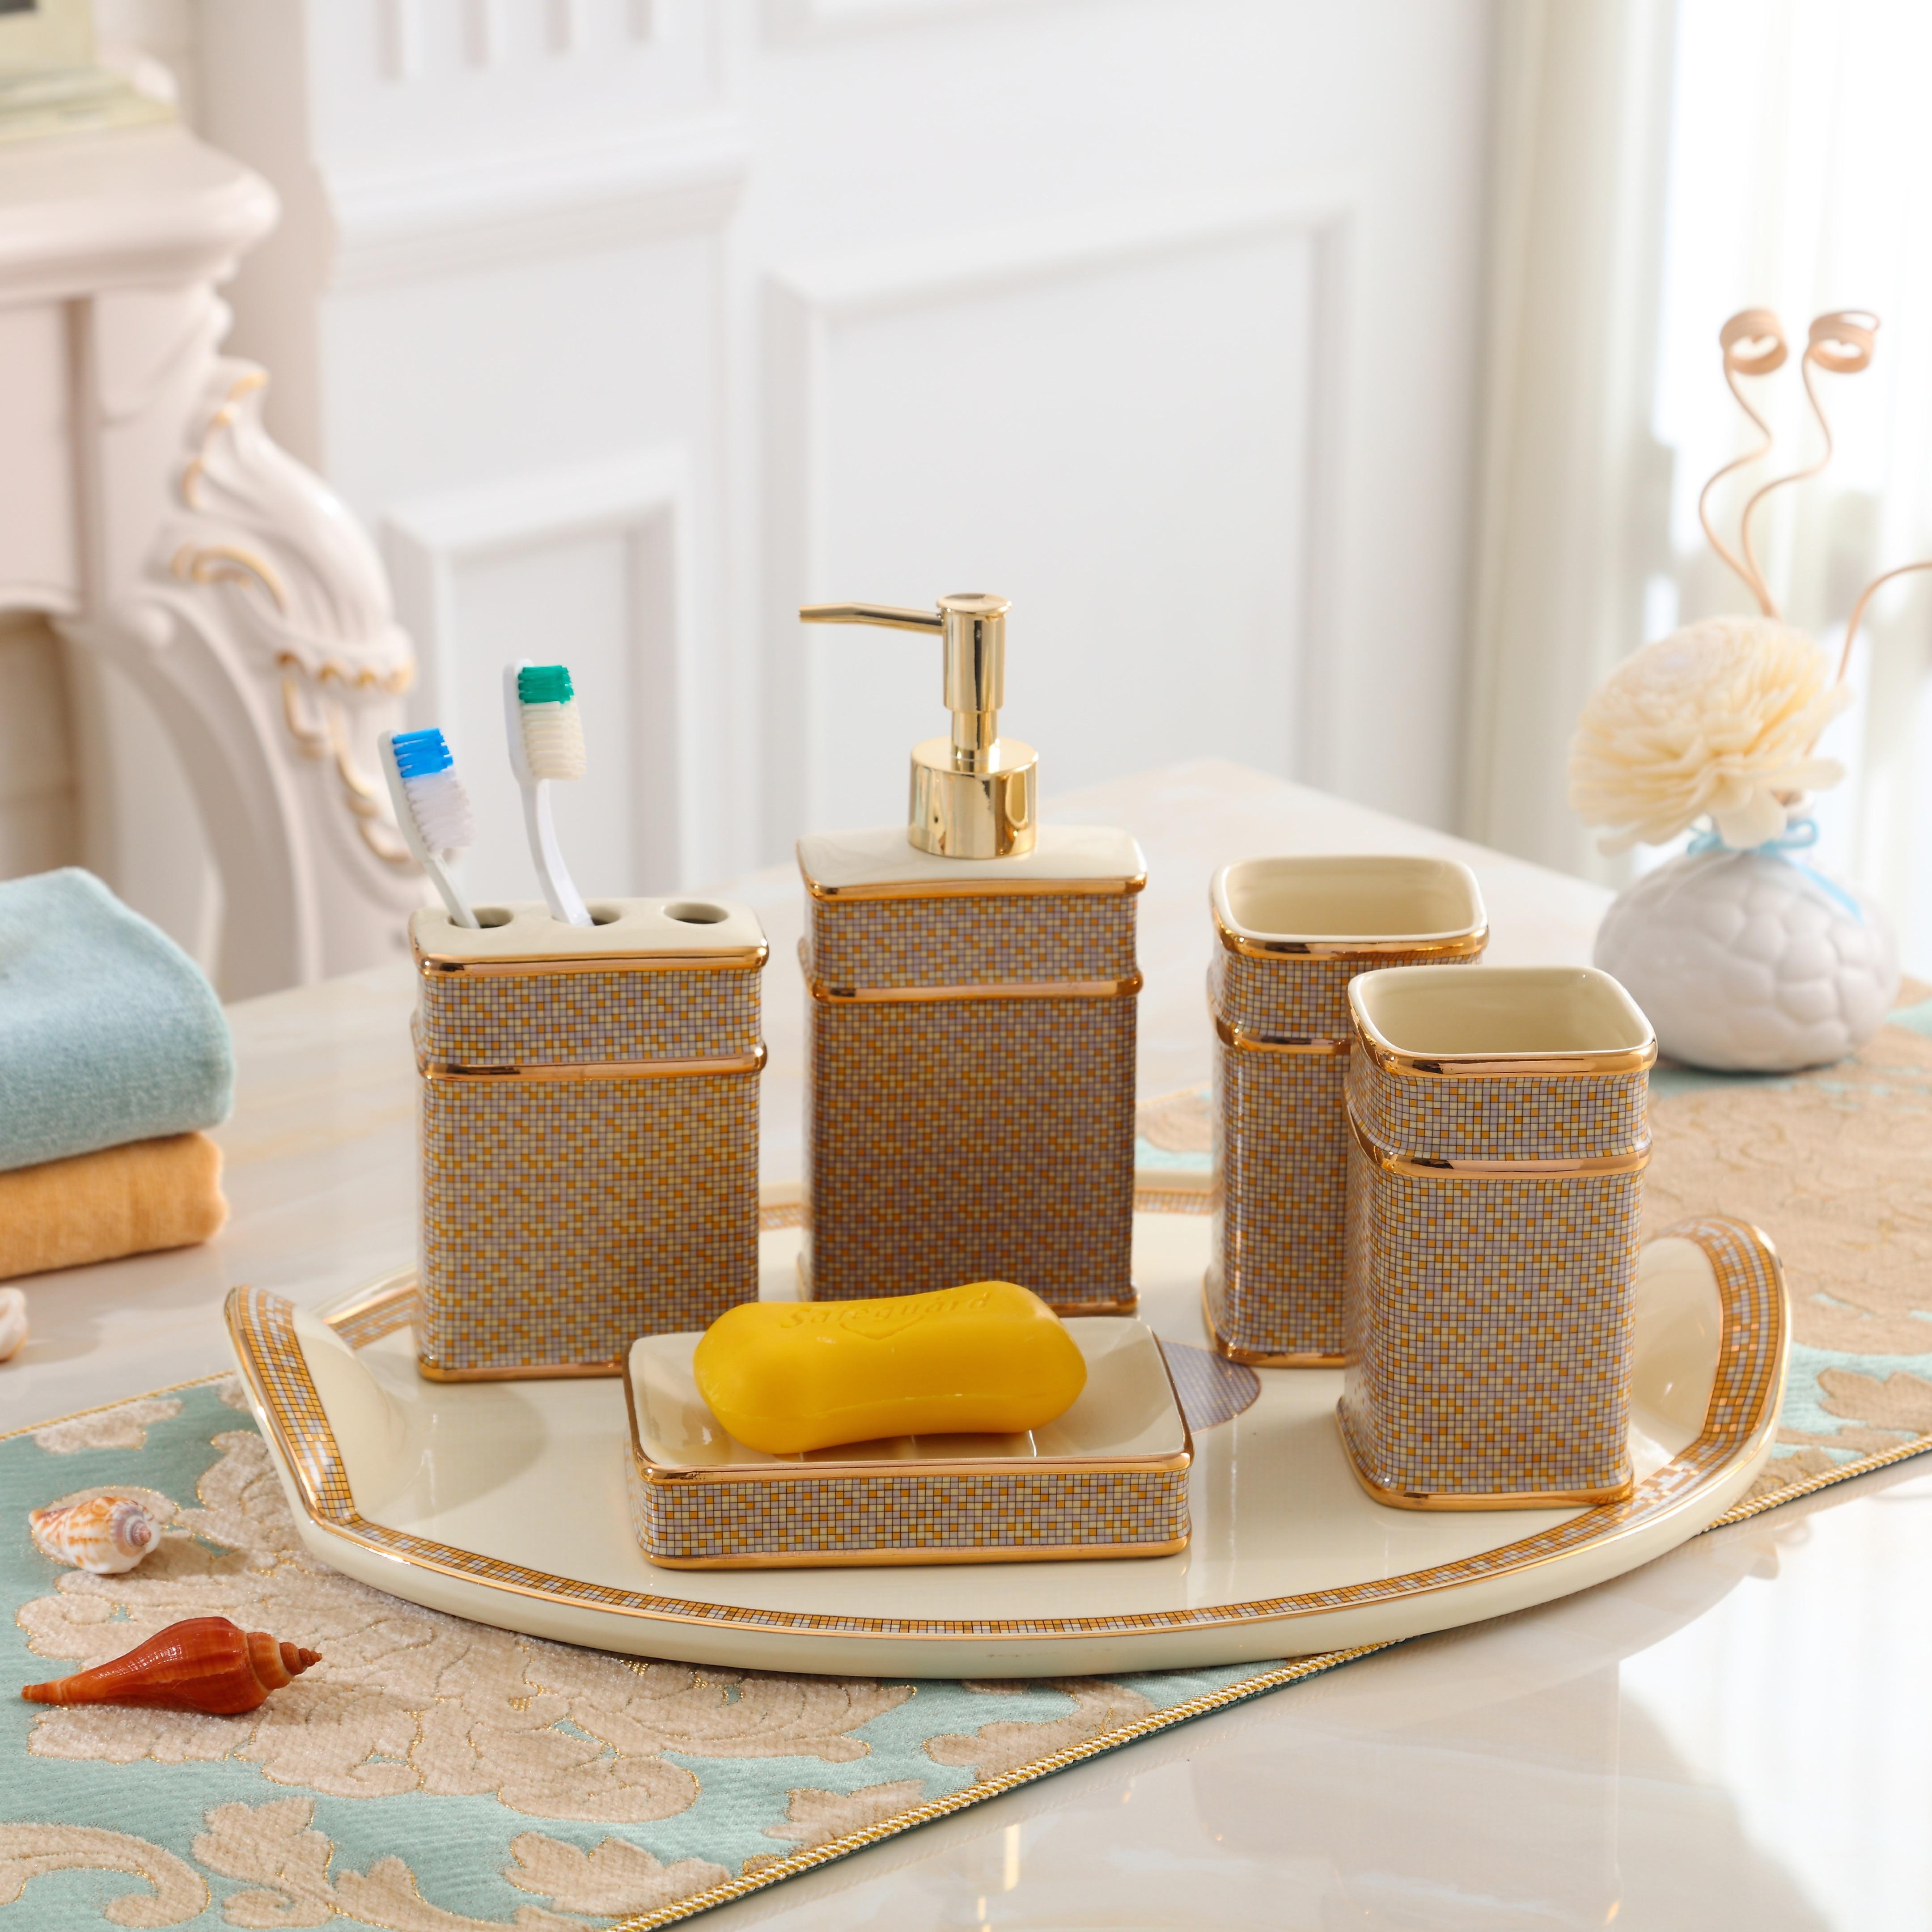 Bathroom Sets Ceramic Liquid Dispenser Toothbrush Holder Soap Dish Cups Accessories Toilet Supplies